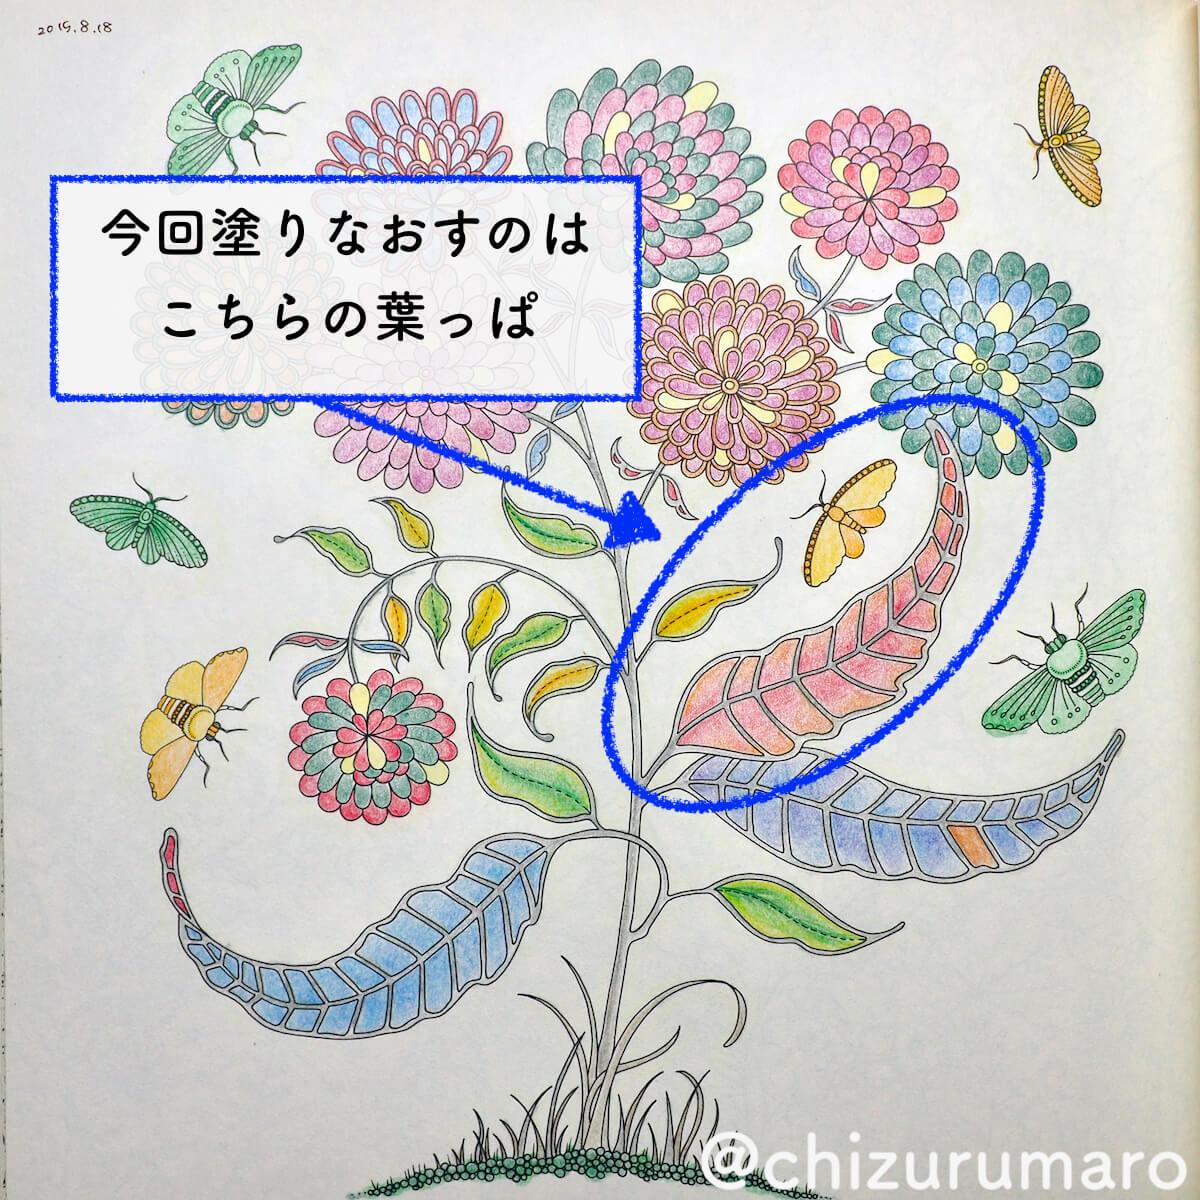 f:id:chizurumaro:20200603120954j:plain